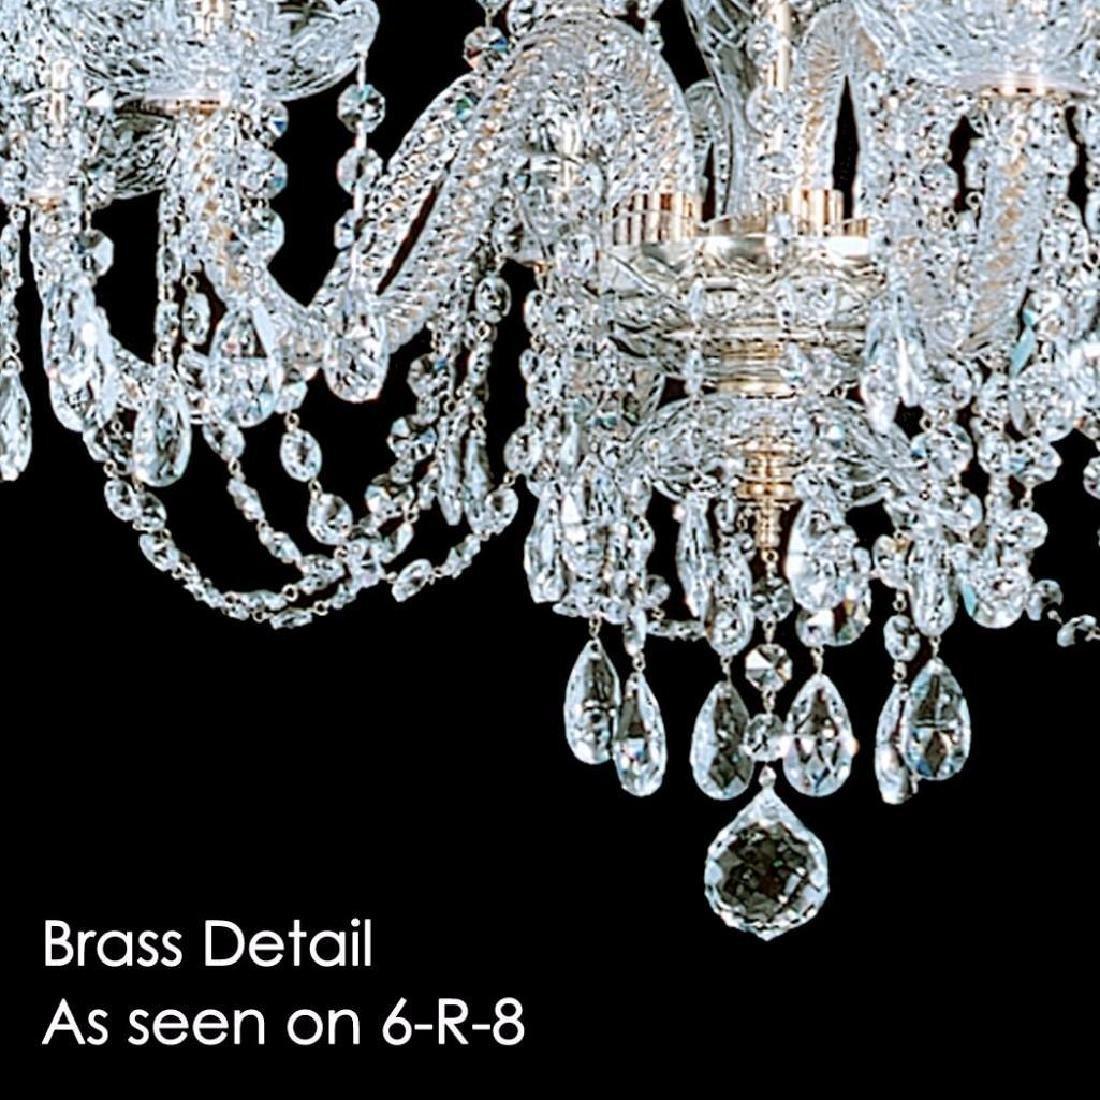 Winter Elegance - 16 Light Crystal Chandelier with - 4